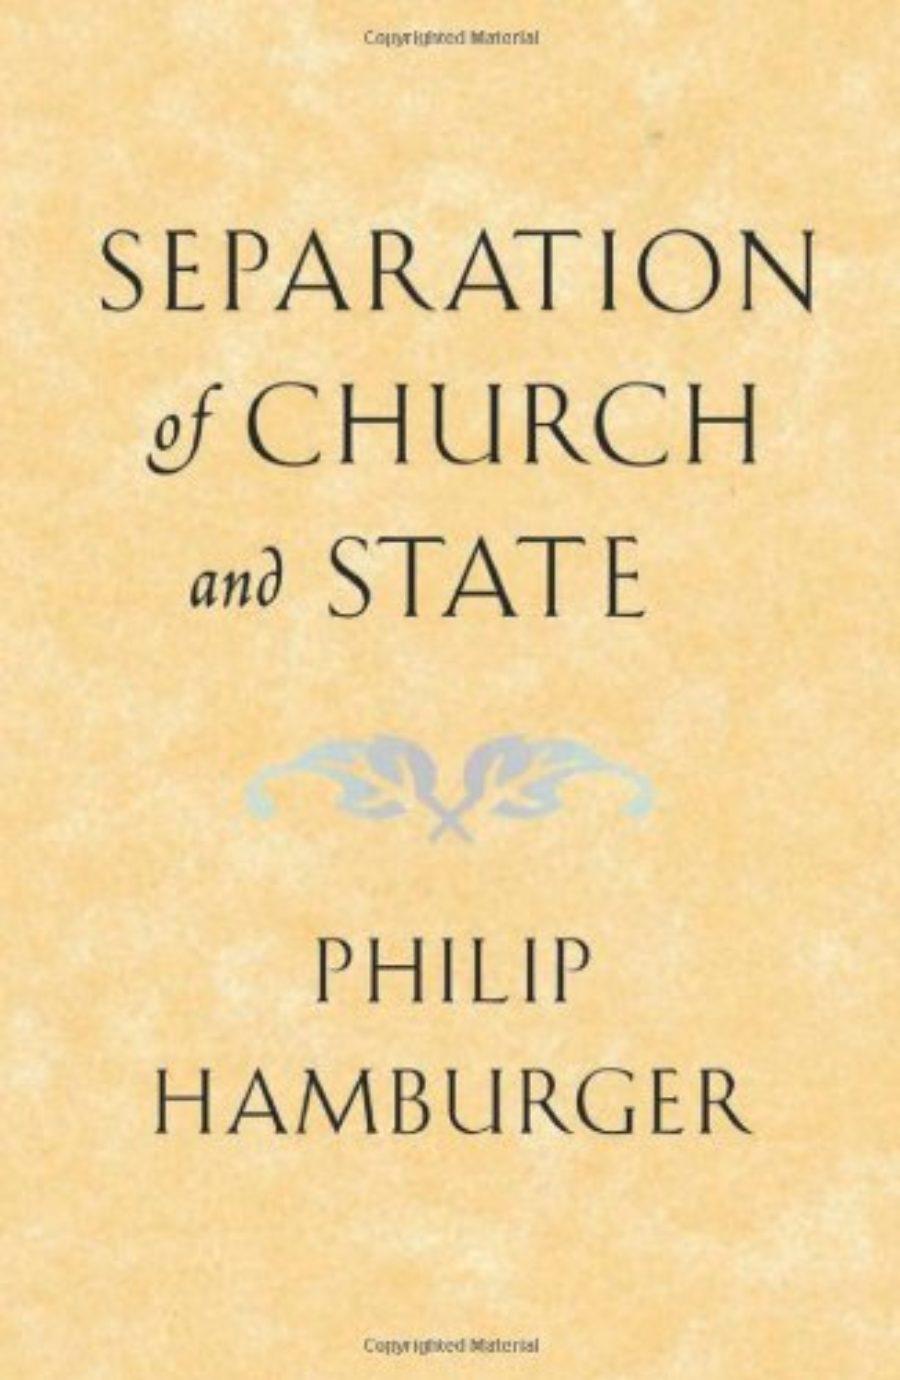 Steven Waldman and Philip Hamburger — The Long Experiment of